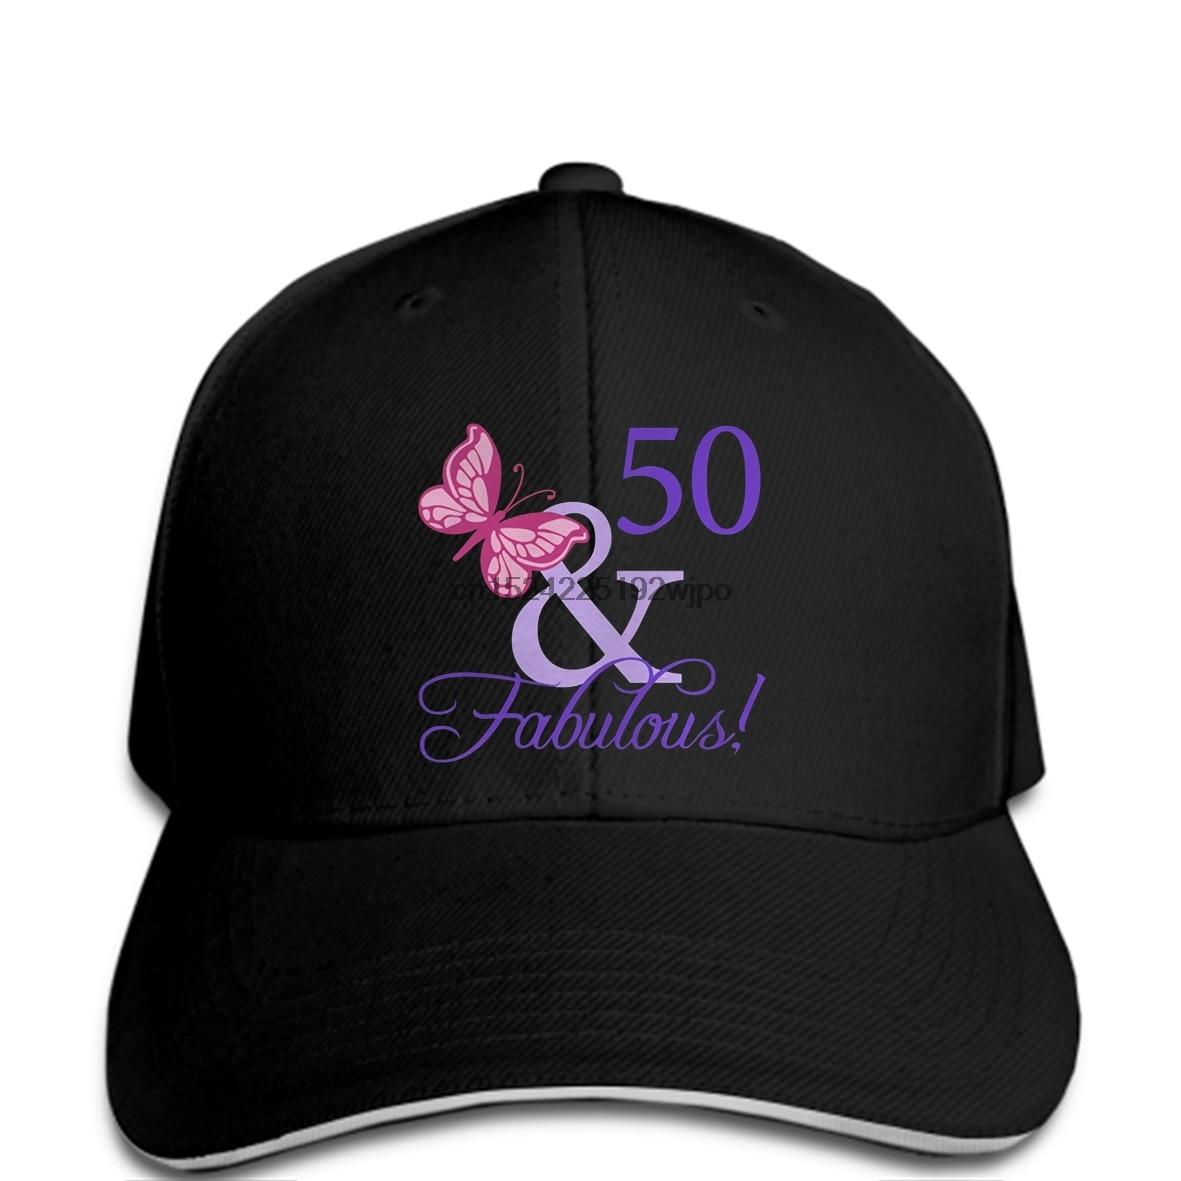 Funny Men Baseball Cap Women Novelty Fabulous 50th Birthday Cool